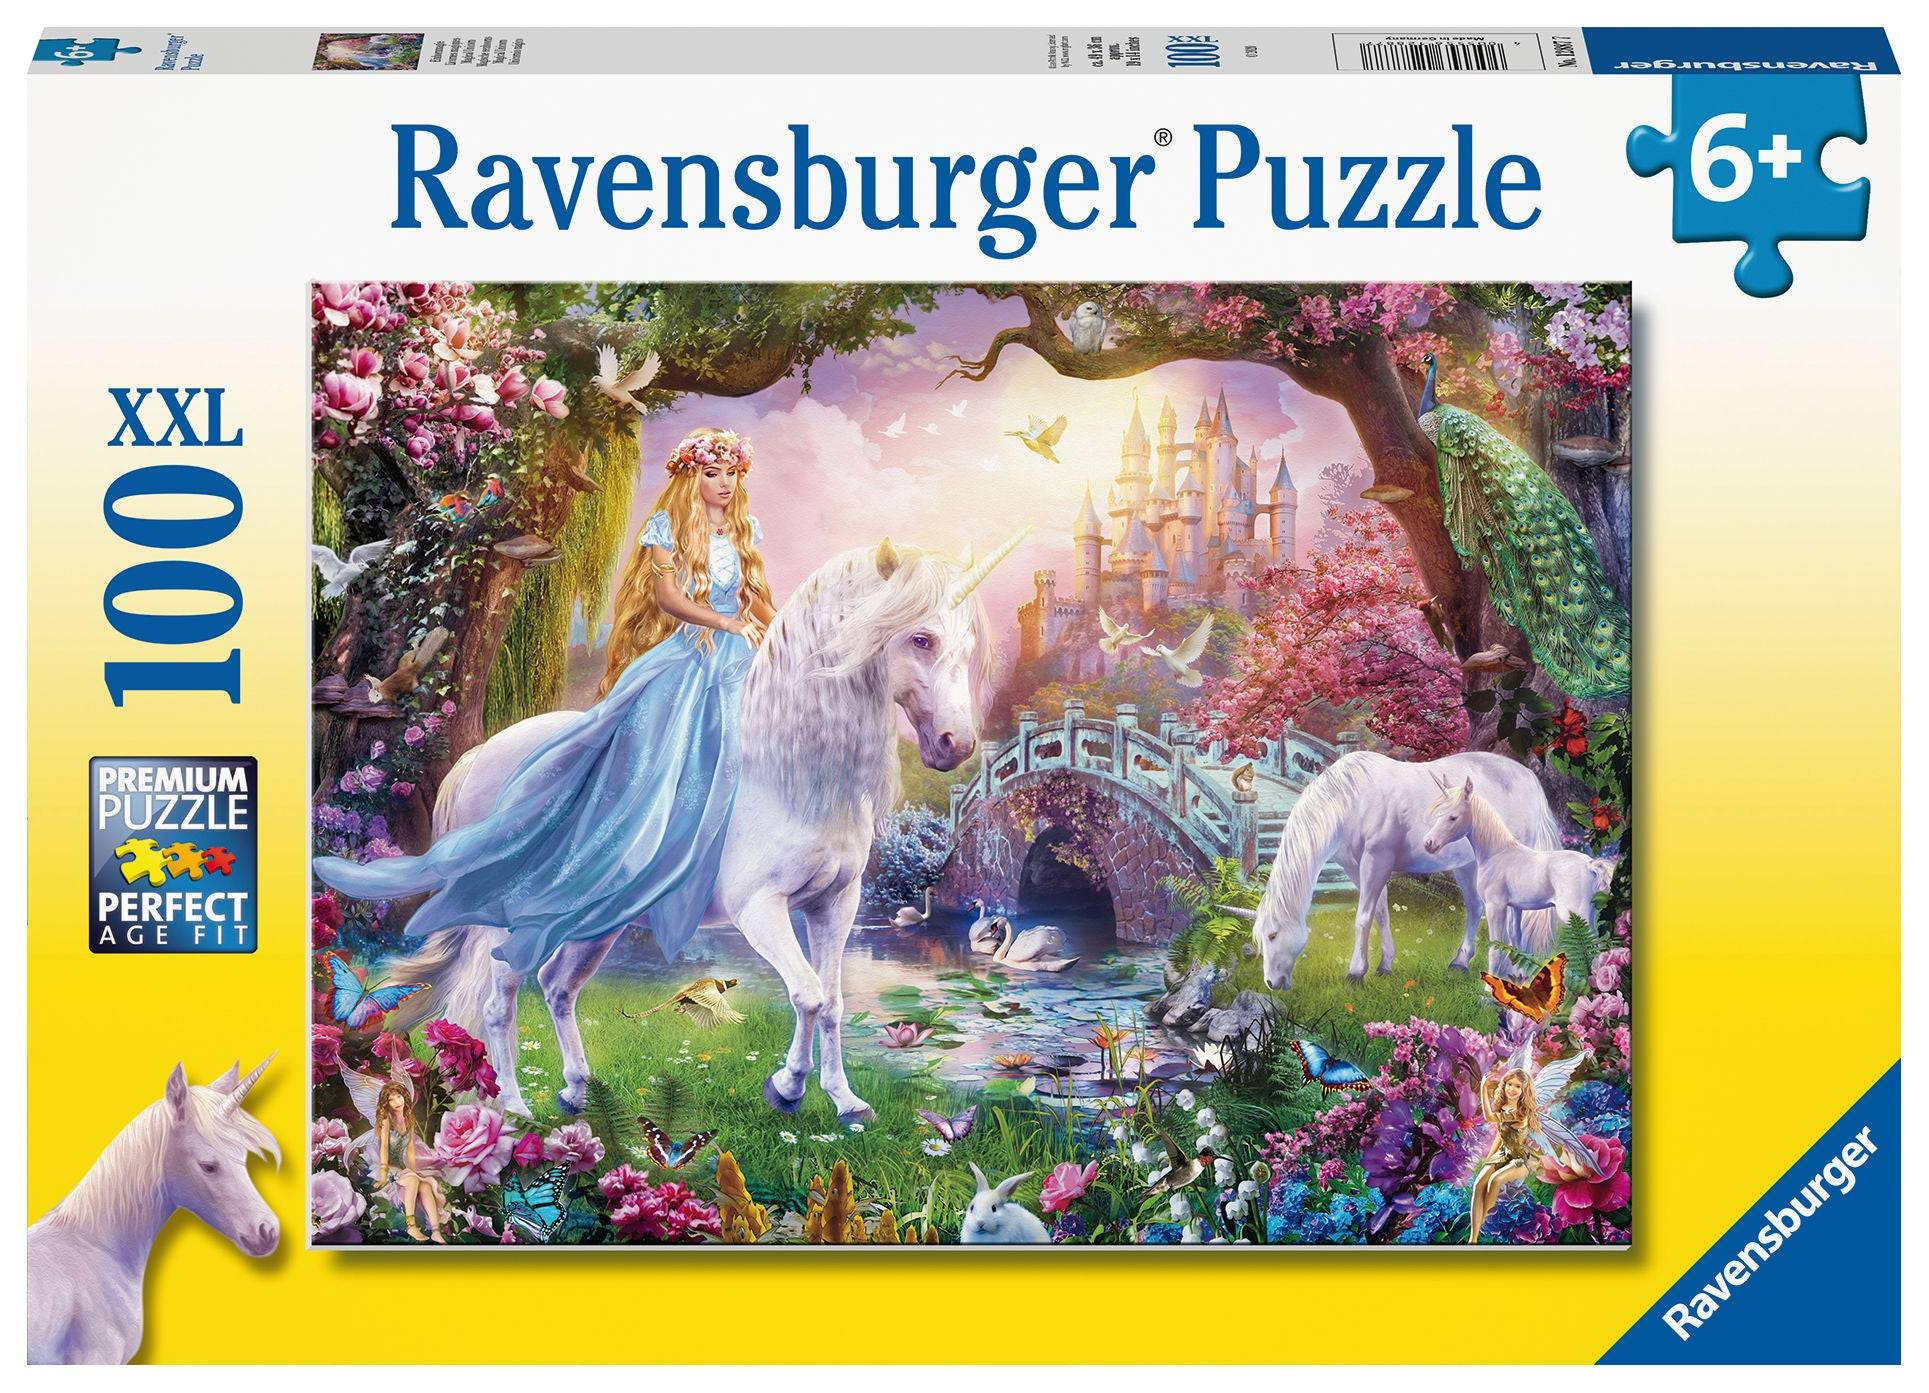 Ravensburger Puslespill Magisk Enhjørning 100 Brikker